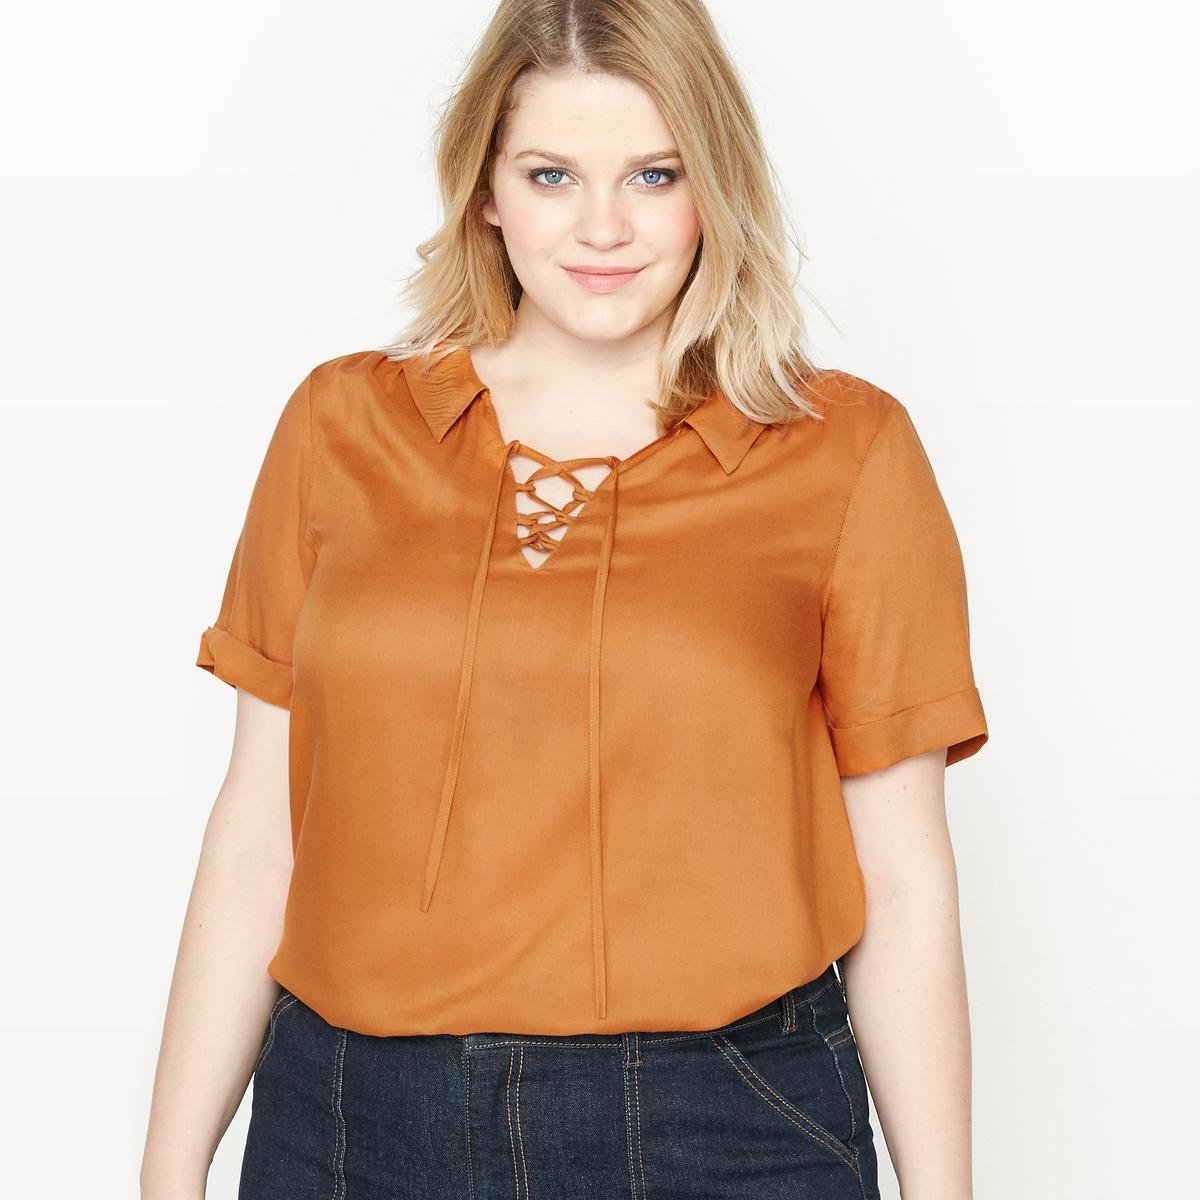 Блузка объемная с короткими рукавами